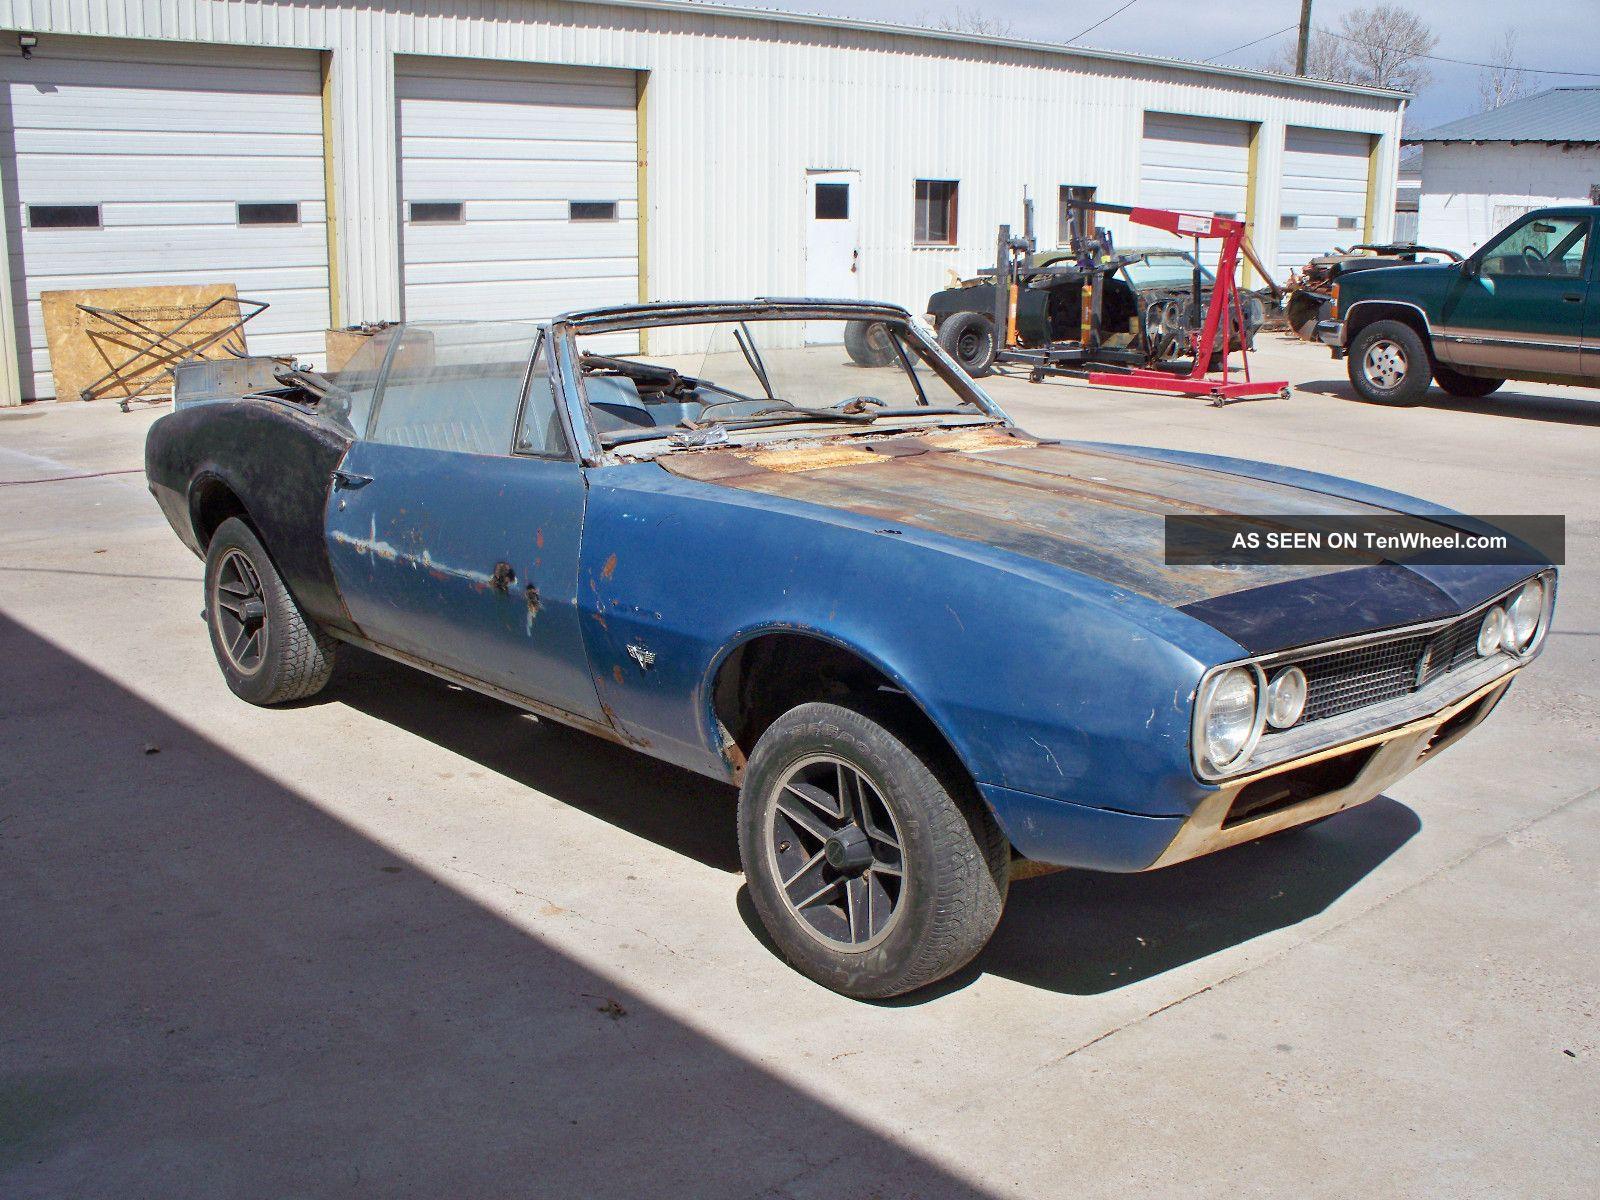 1967 Camaro Convertible Custom Pro Touring Hot Rod Project Car